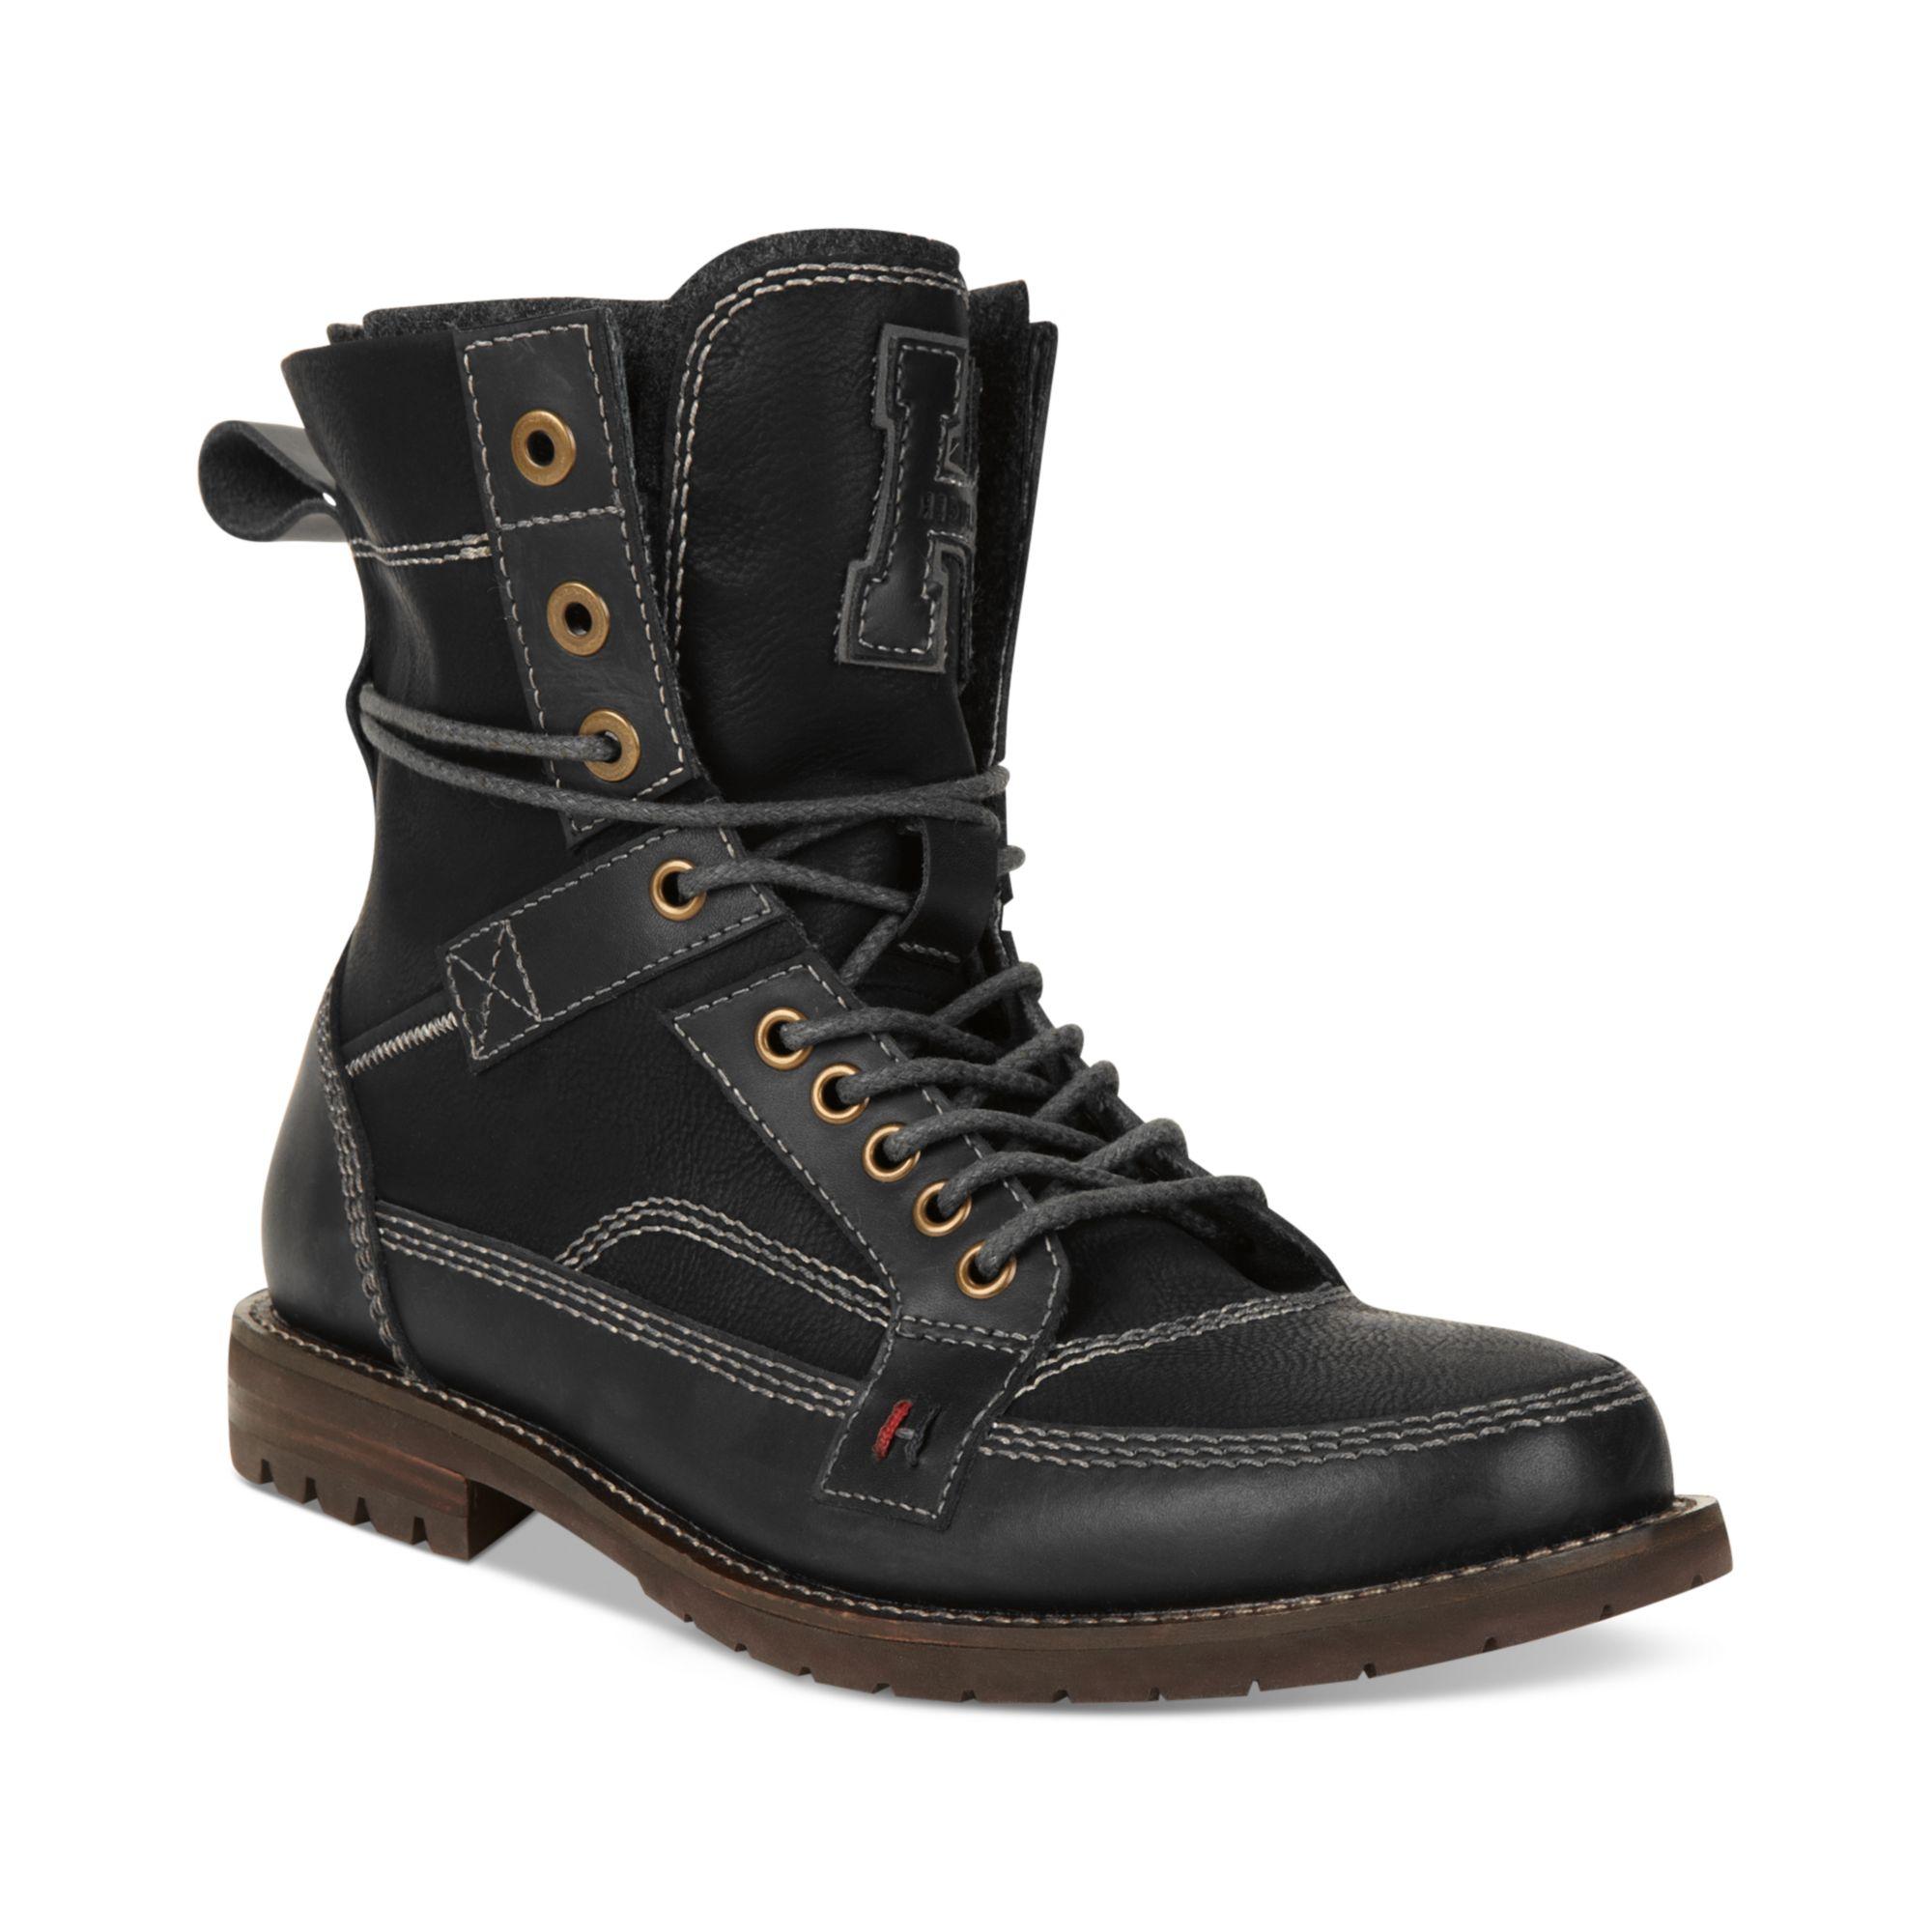 21 awesome tommy hilfiger women boots. Black Bedroom Furniture Sets. Home Design Ideas